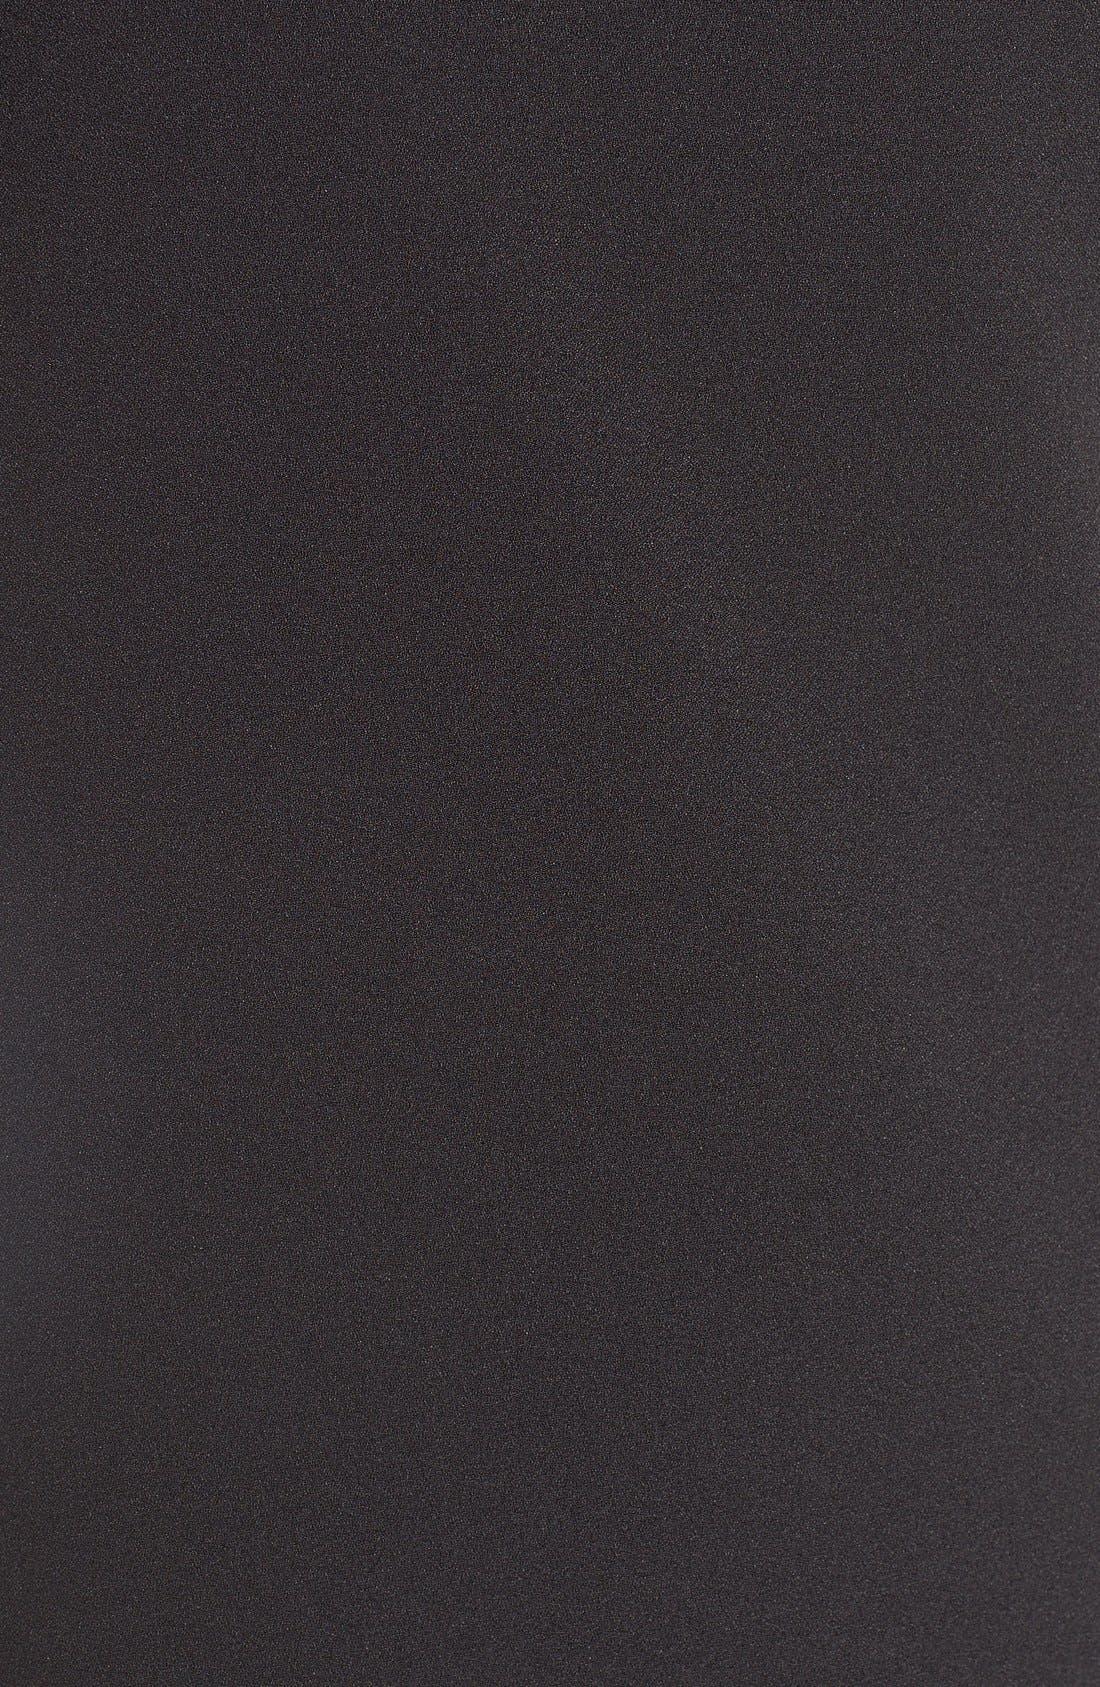 'Peek-A-Boo' Cold Shoulder Shift Dress,                             Alternate thumbnail 5, color,                             Black